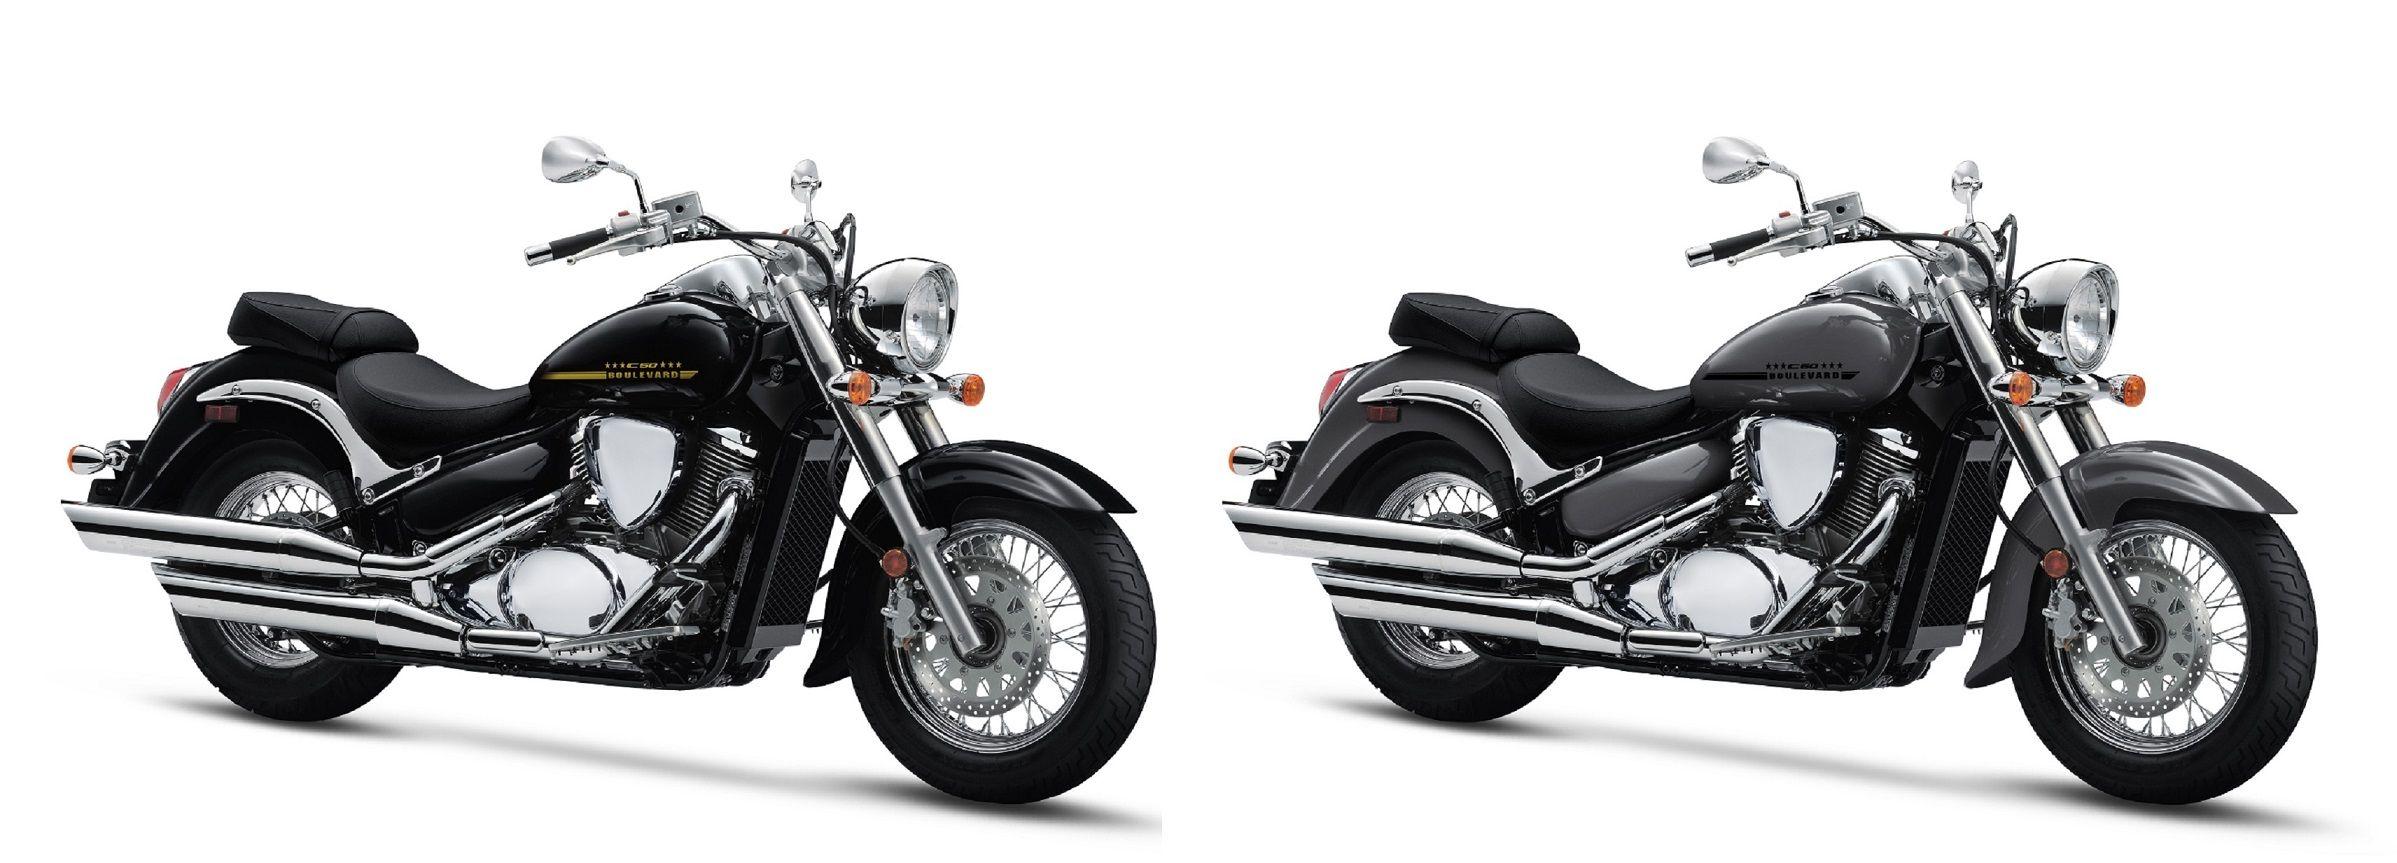 "Hand Grips 1/"" 25mm For Harley Road King Custom Classic// FXDB Street Bob"